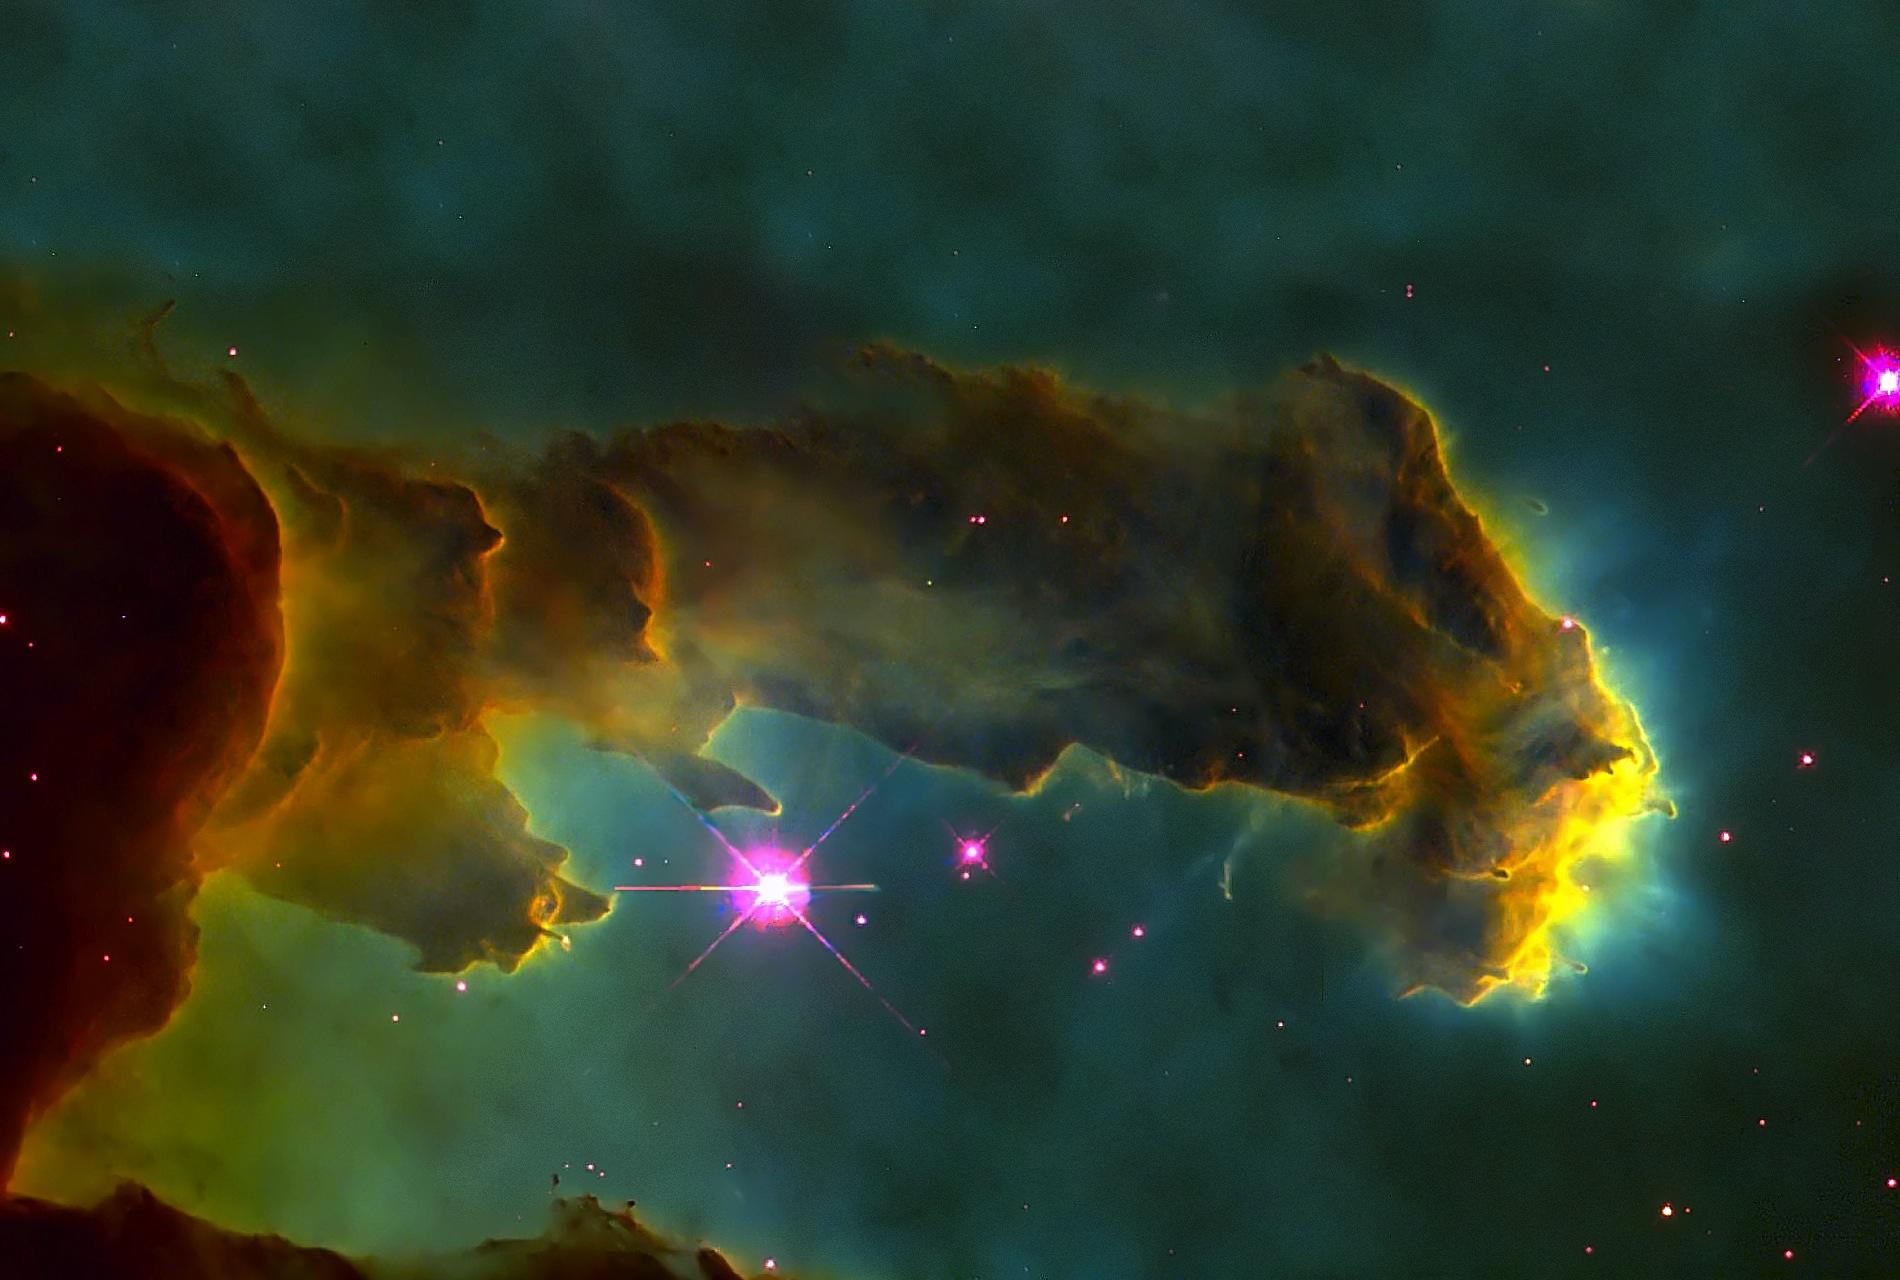 Pillars Of Creation Wallpaper Hd: Eagle Nebula Wallpaper HD